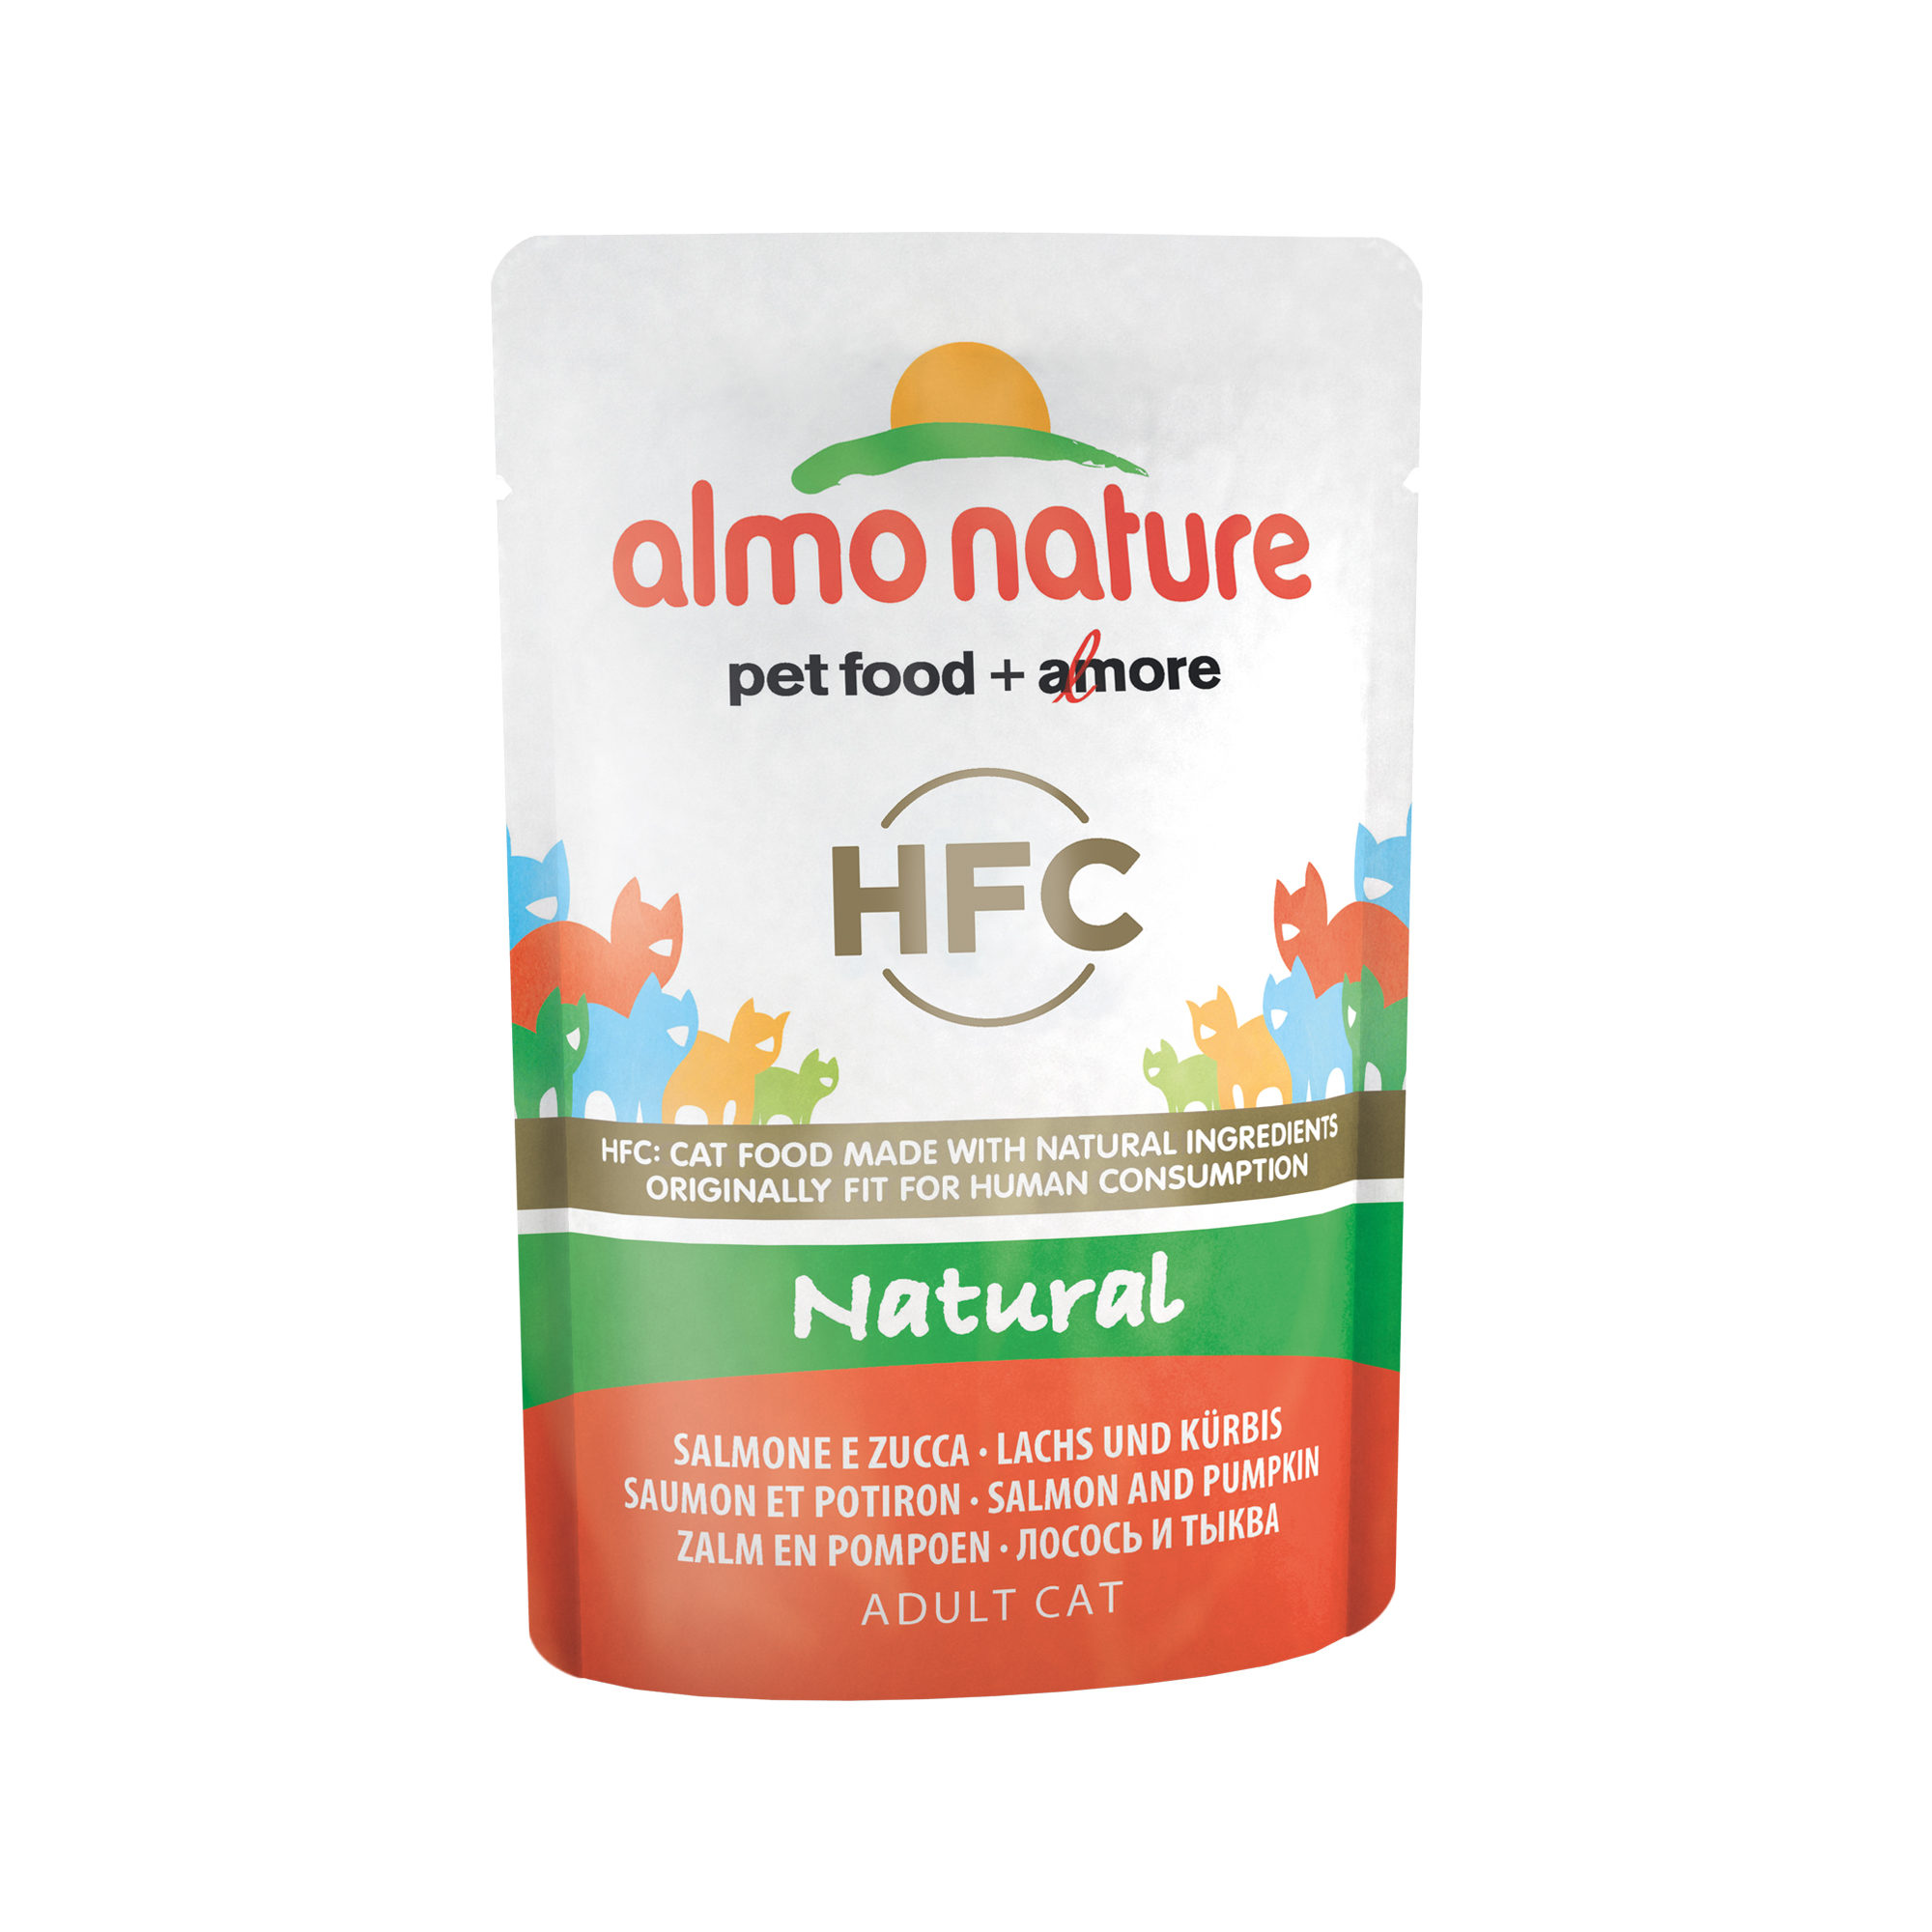 Almo Nature HFC Natural Katzenfutter - Dosen - Lachs & Kürbis - 25 x 55 g